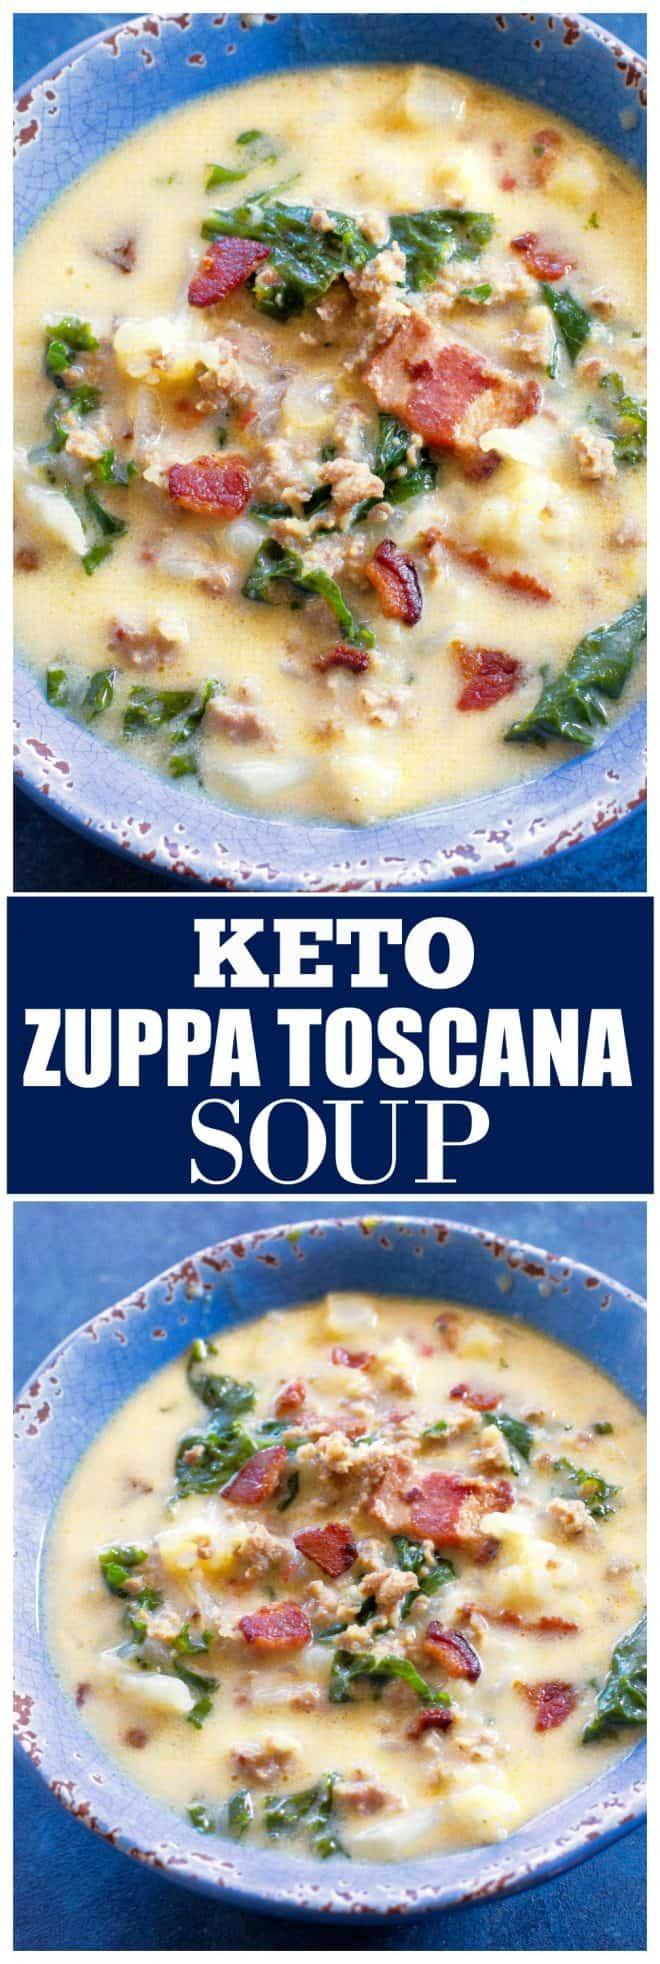 Keto Zuppa Toscana